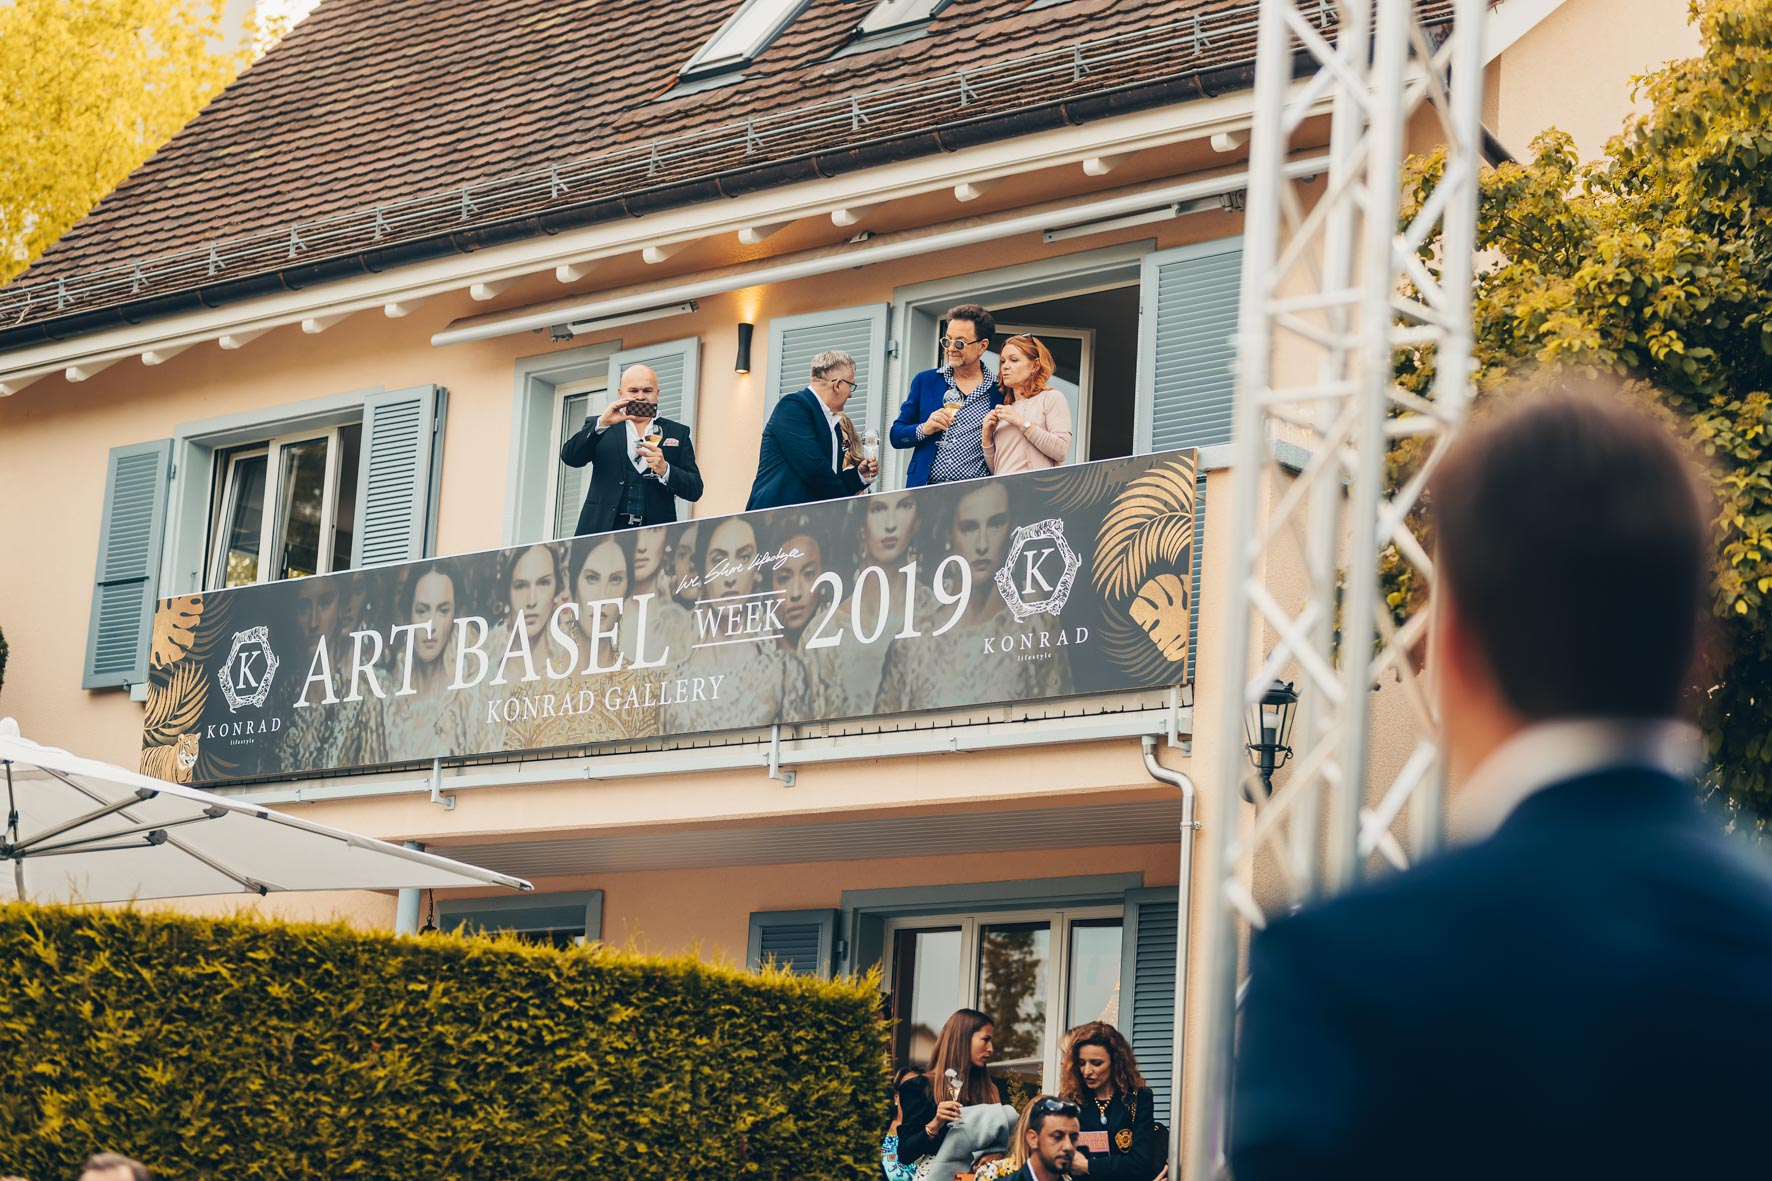 Konrad-lifestyle-art-basel-%22gold-member-experience%22-2019-28.jpg